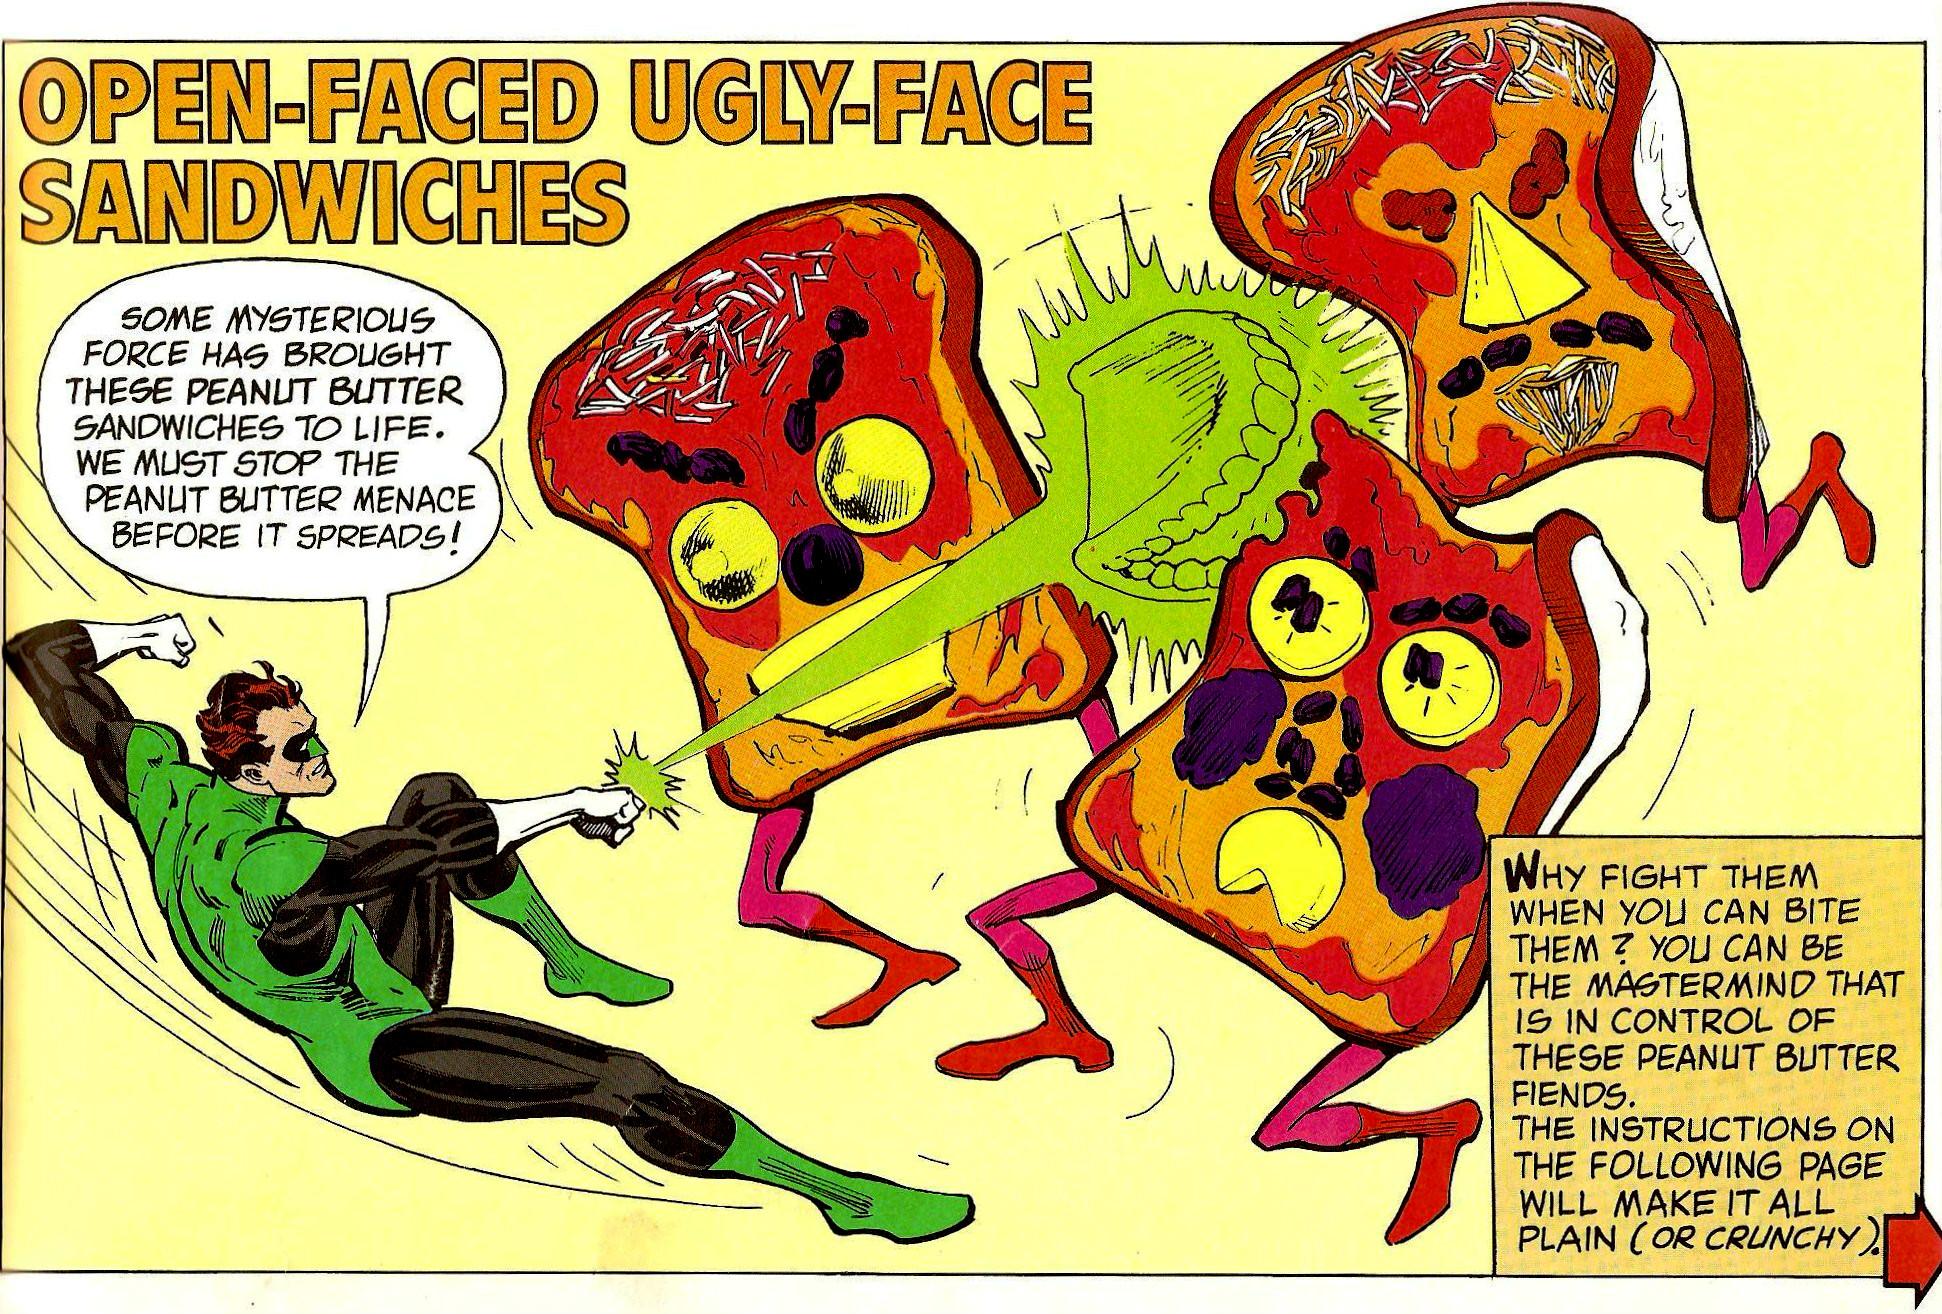 ugy-face-sandwiches